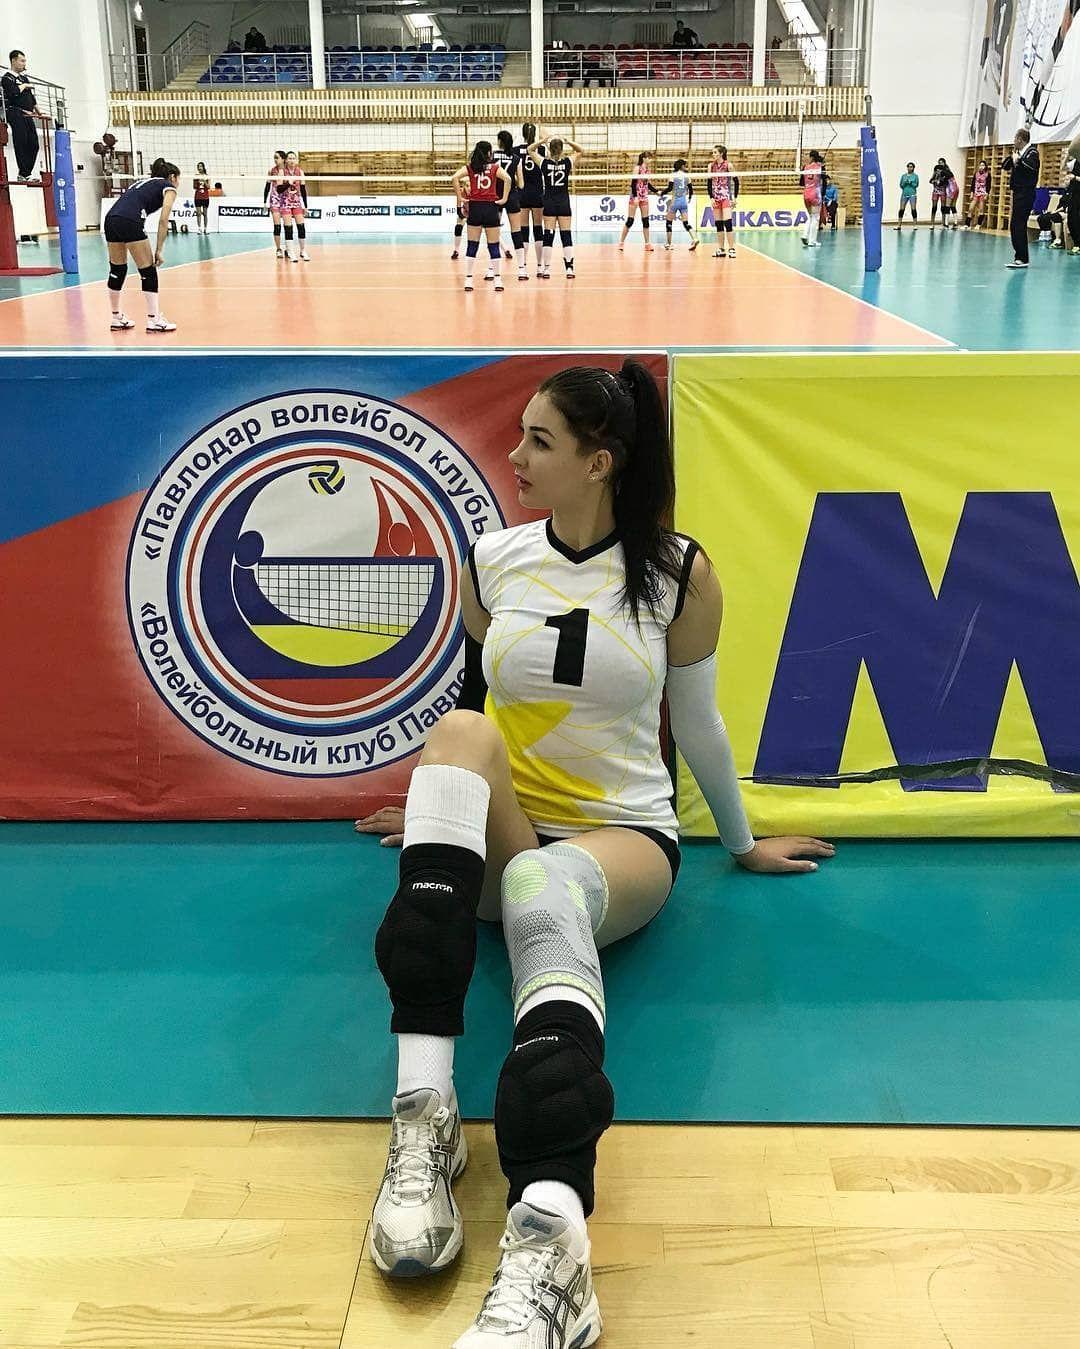 Follow Atletputri For More Pict Tatarka5 Follow Atletputri Follow Atletputri Follow Atletputri Voll Basketball Court Sports Basketball